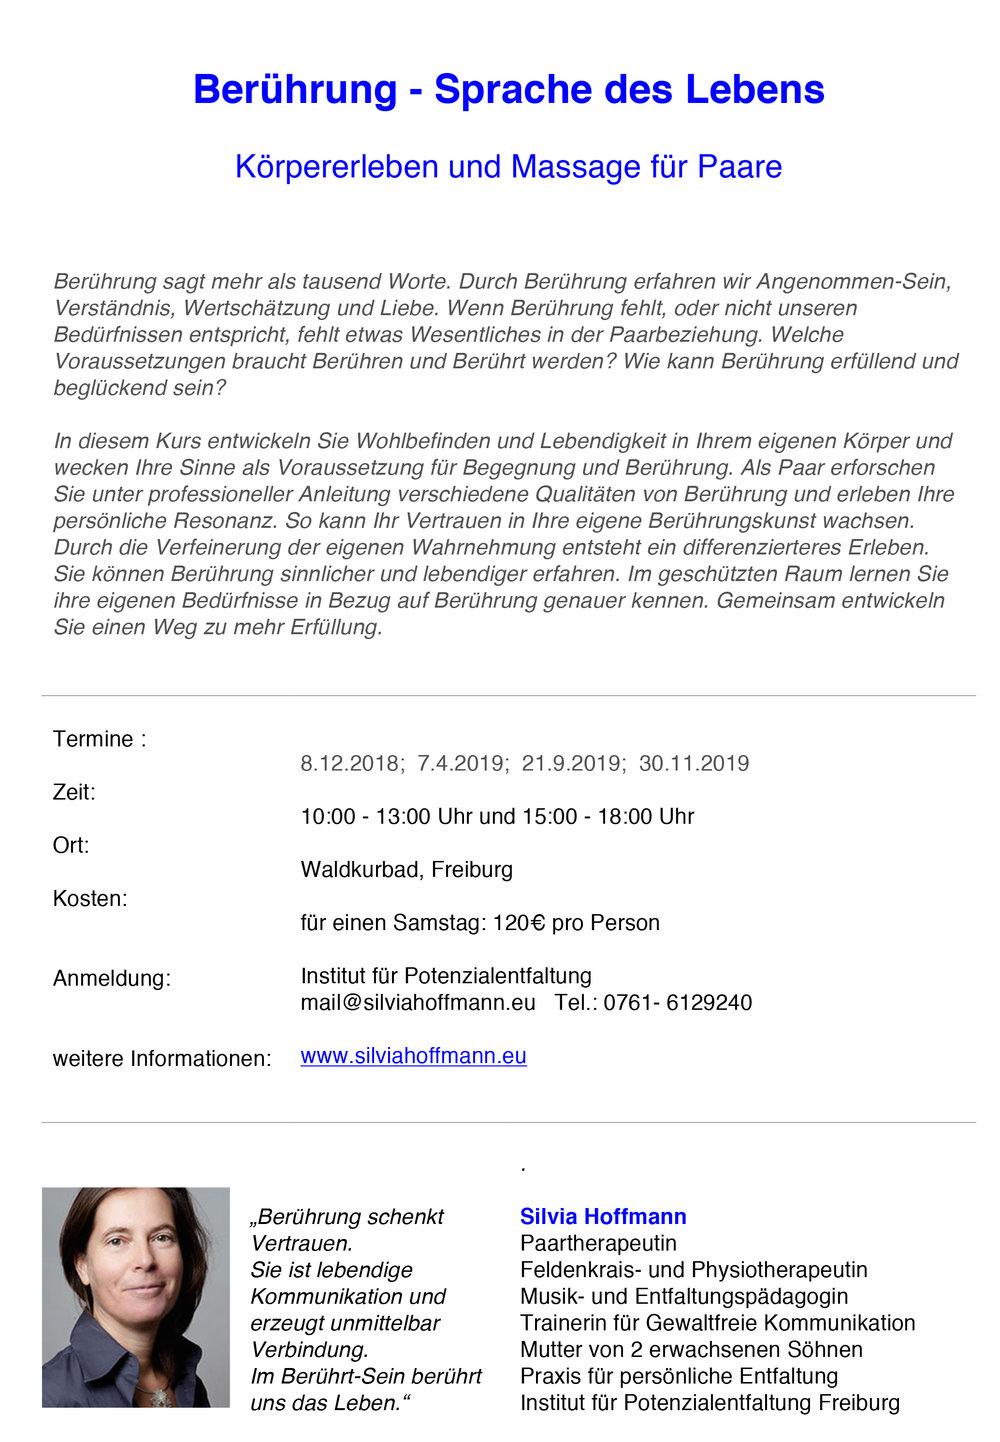 Bild Flyer Berührung u Massage  f Paare 2018-19.jpg